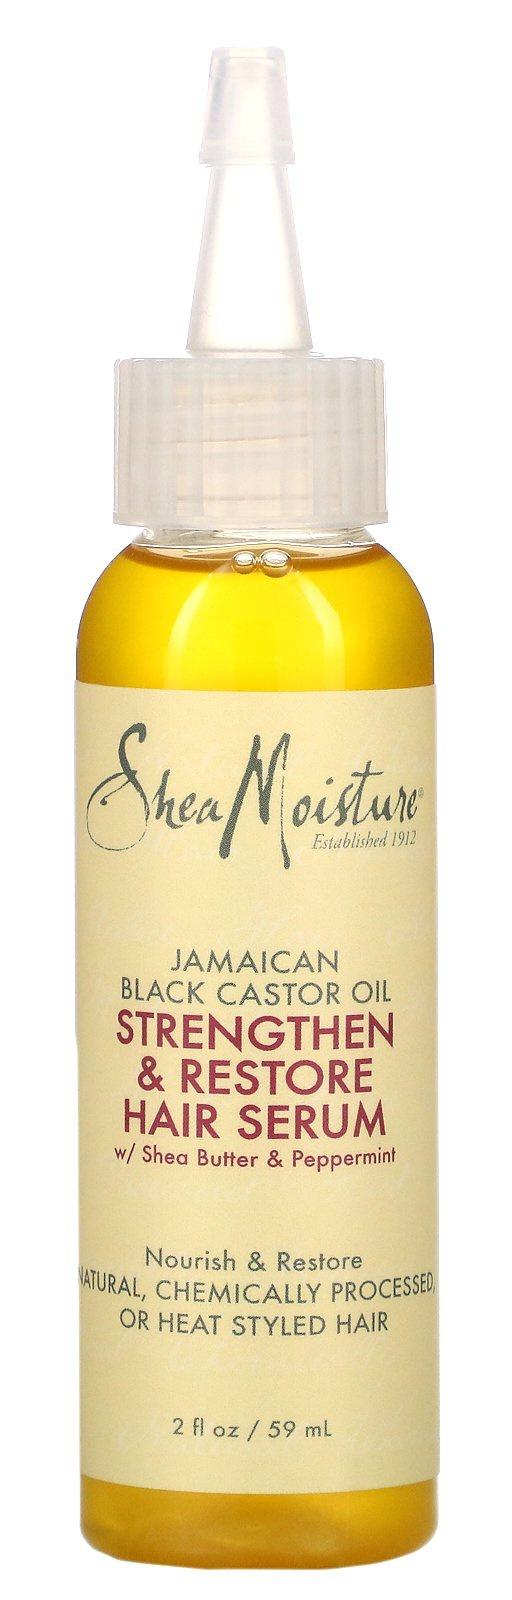 Shea Moisture Jamaican Black Castor Oil Strengthen & Restore Oil Serum